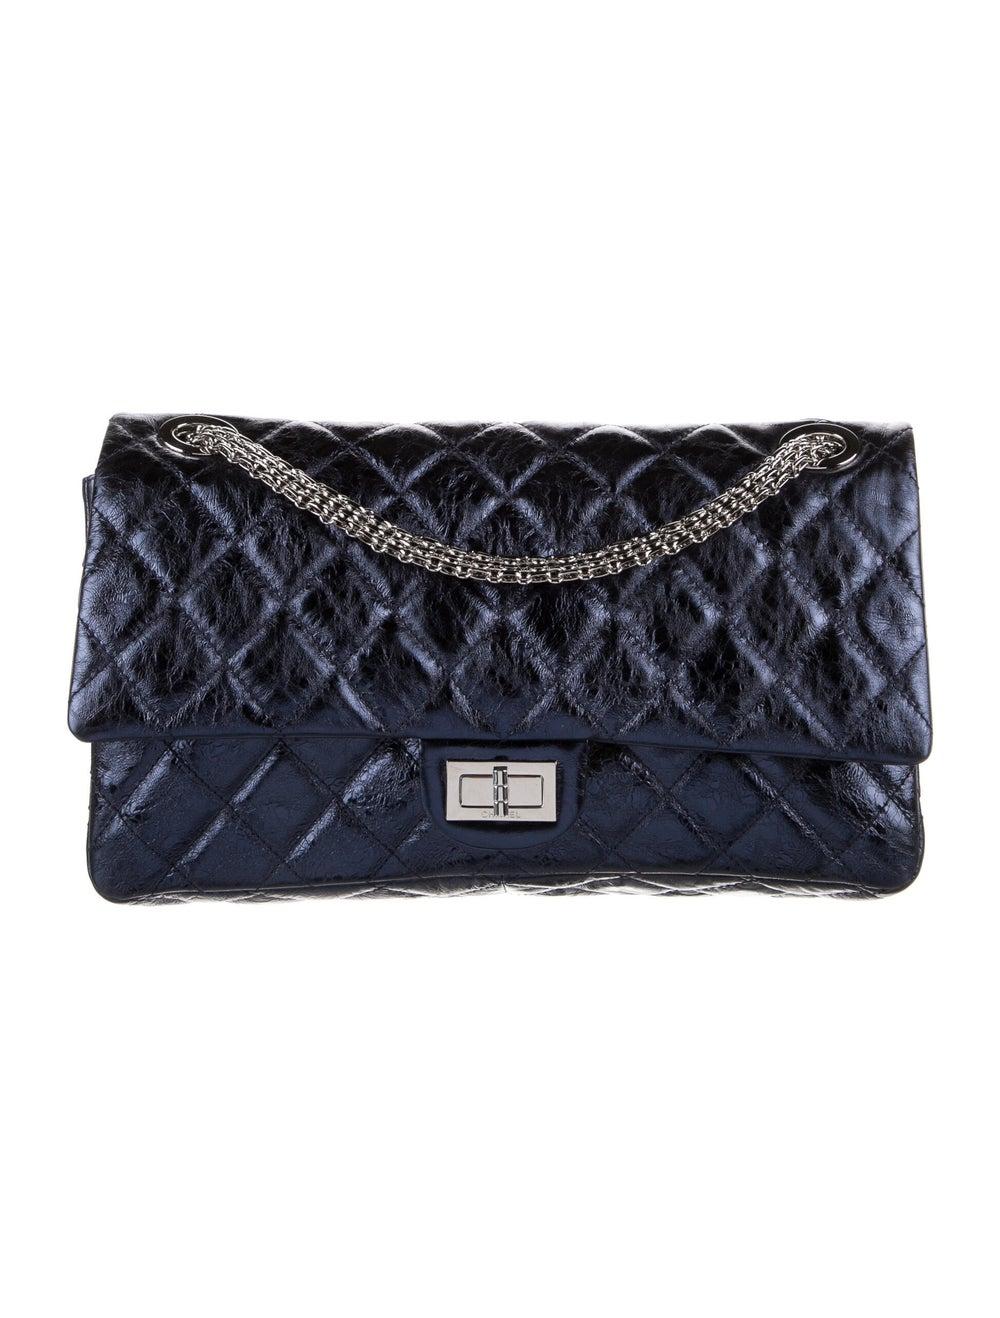 Chanel Reissue 228 Double Flap Bag Blue - image 1